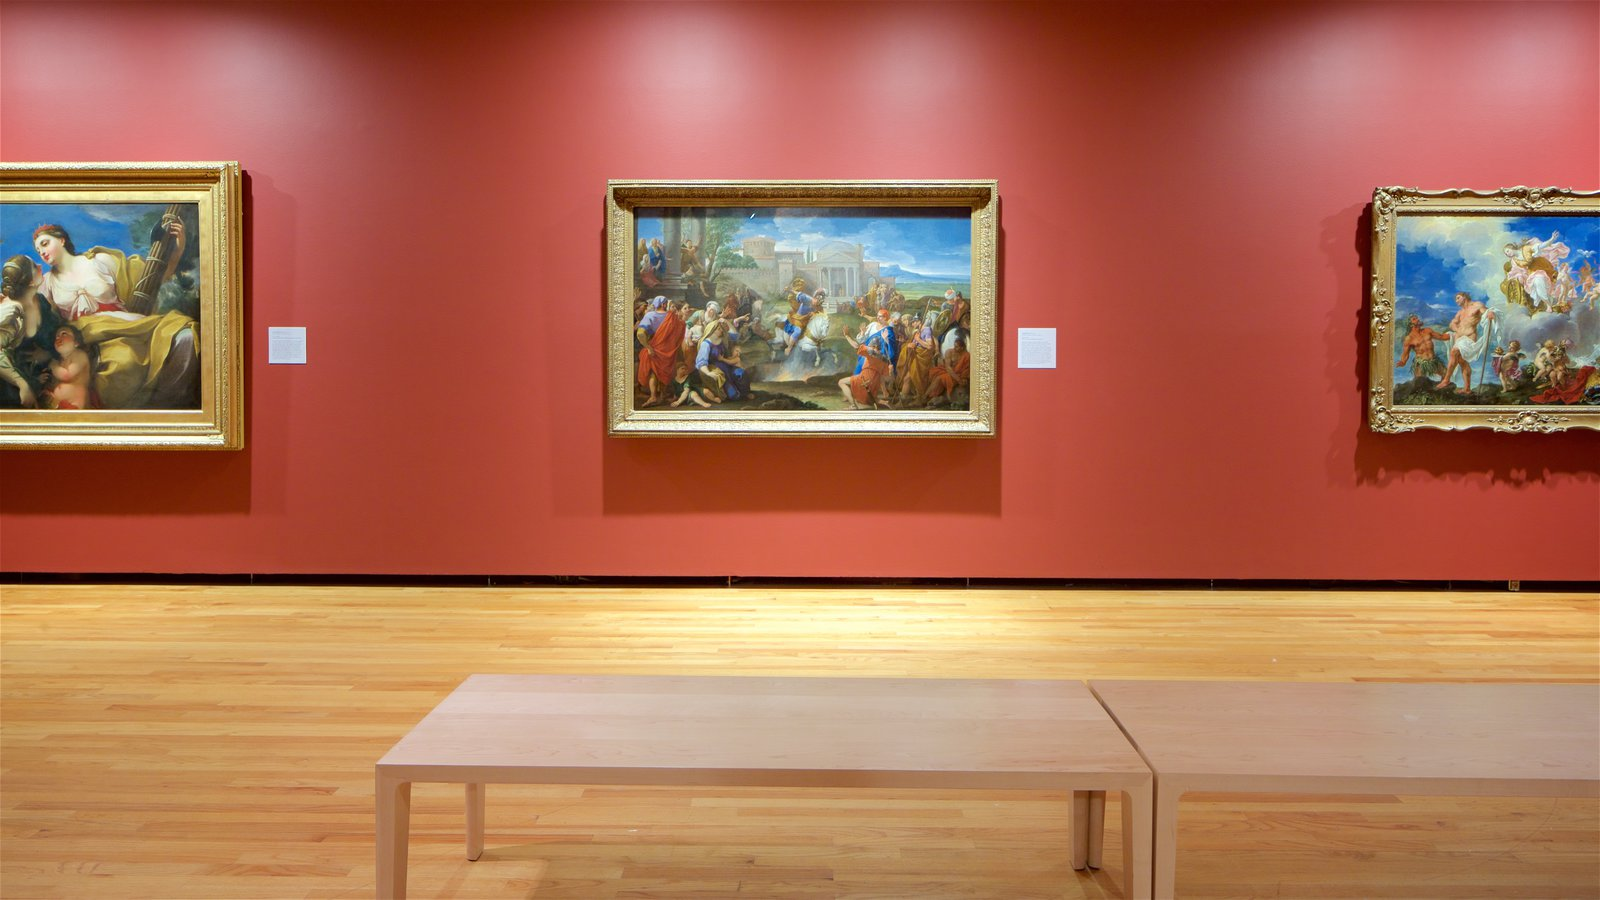 Fotos de galer a de arte de vancouver ver fotos e for Art galleries that buy art